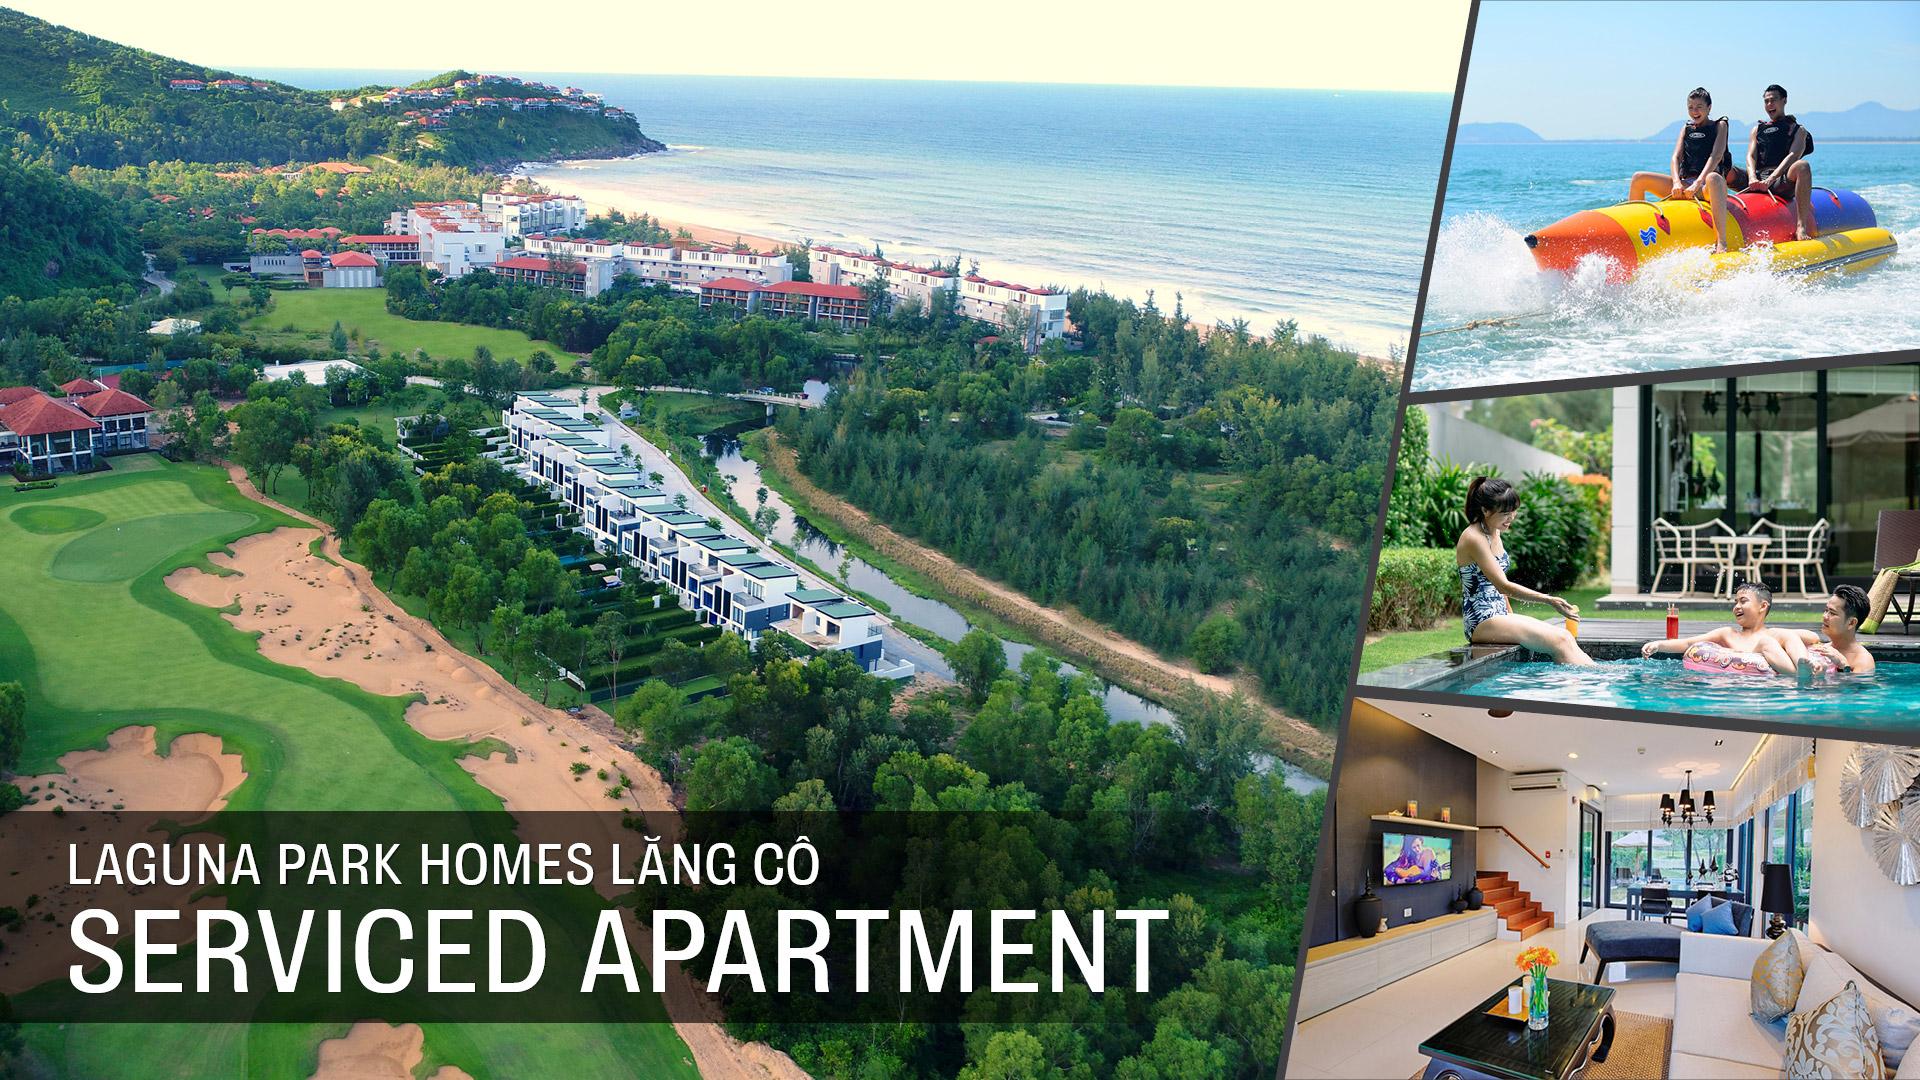 Laguna Park Homes Lăng Cô Serviced Apartment